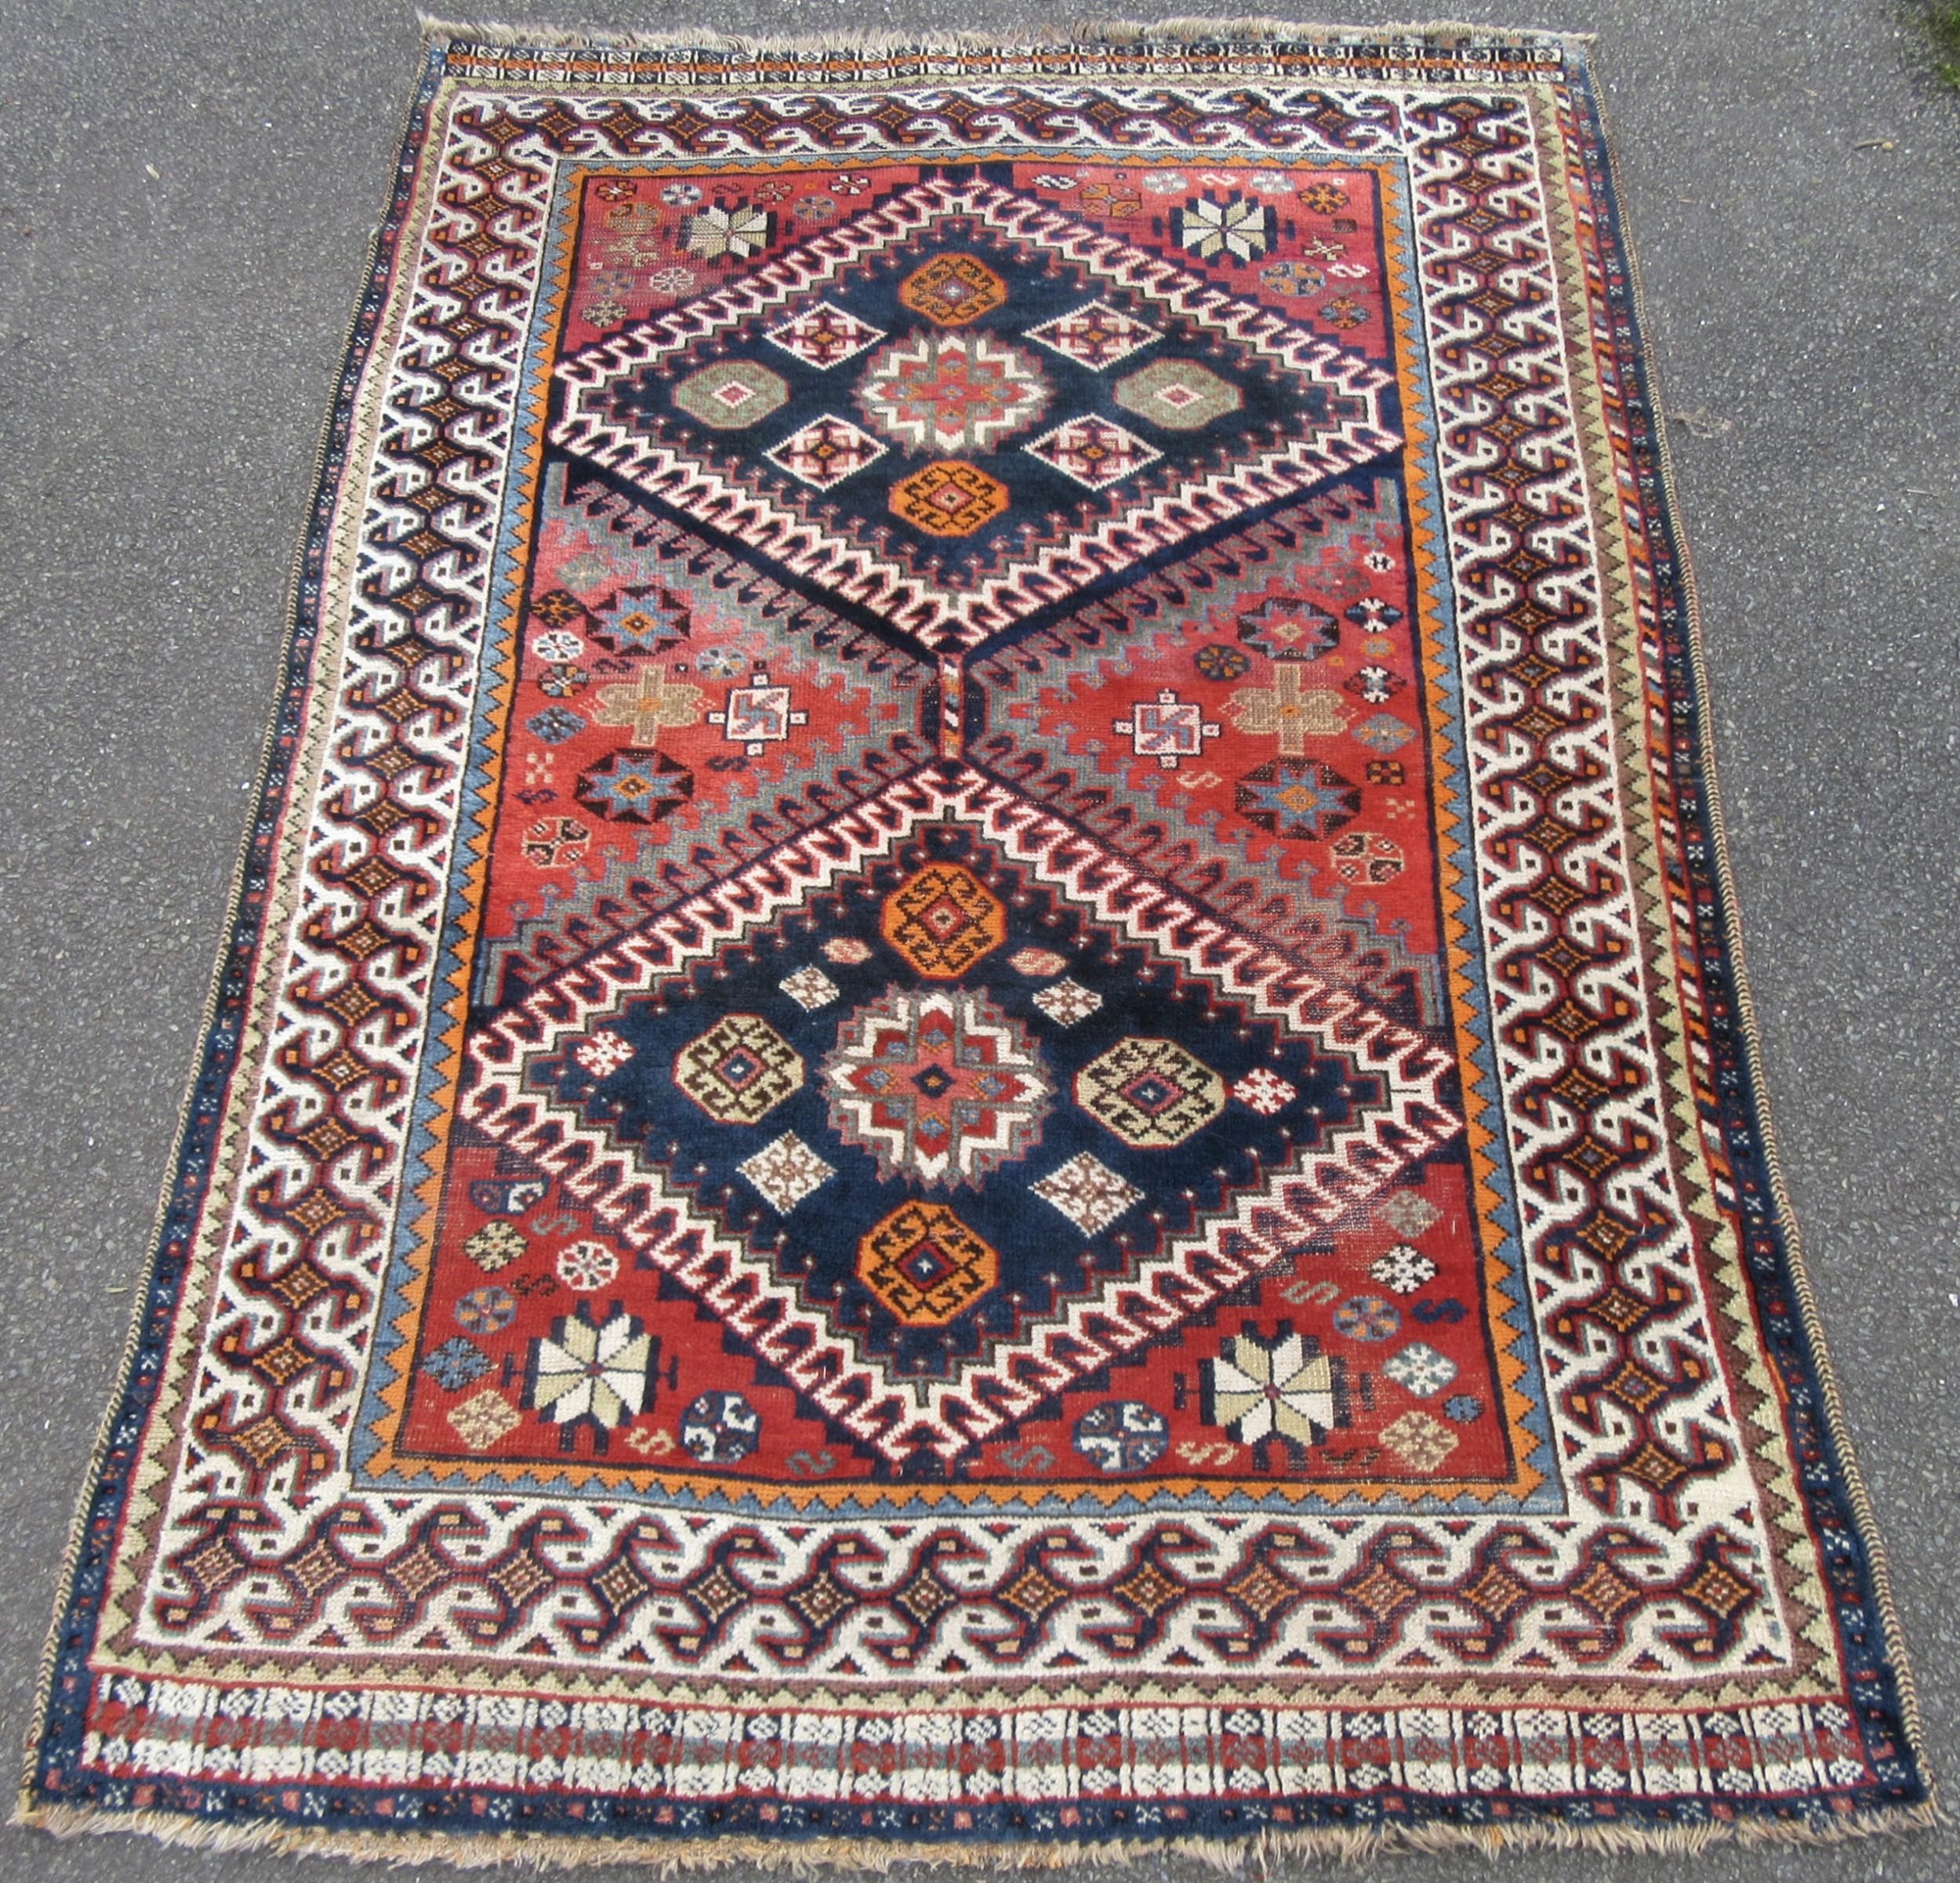 unusual antique south west persian fars shiraz region qashqai tribal rug